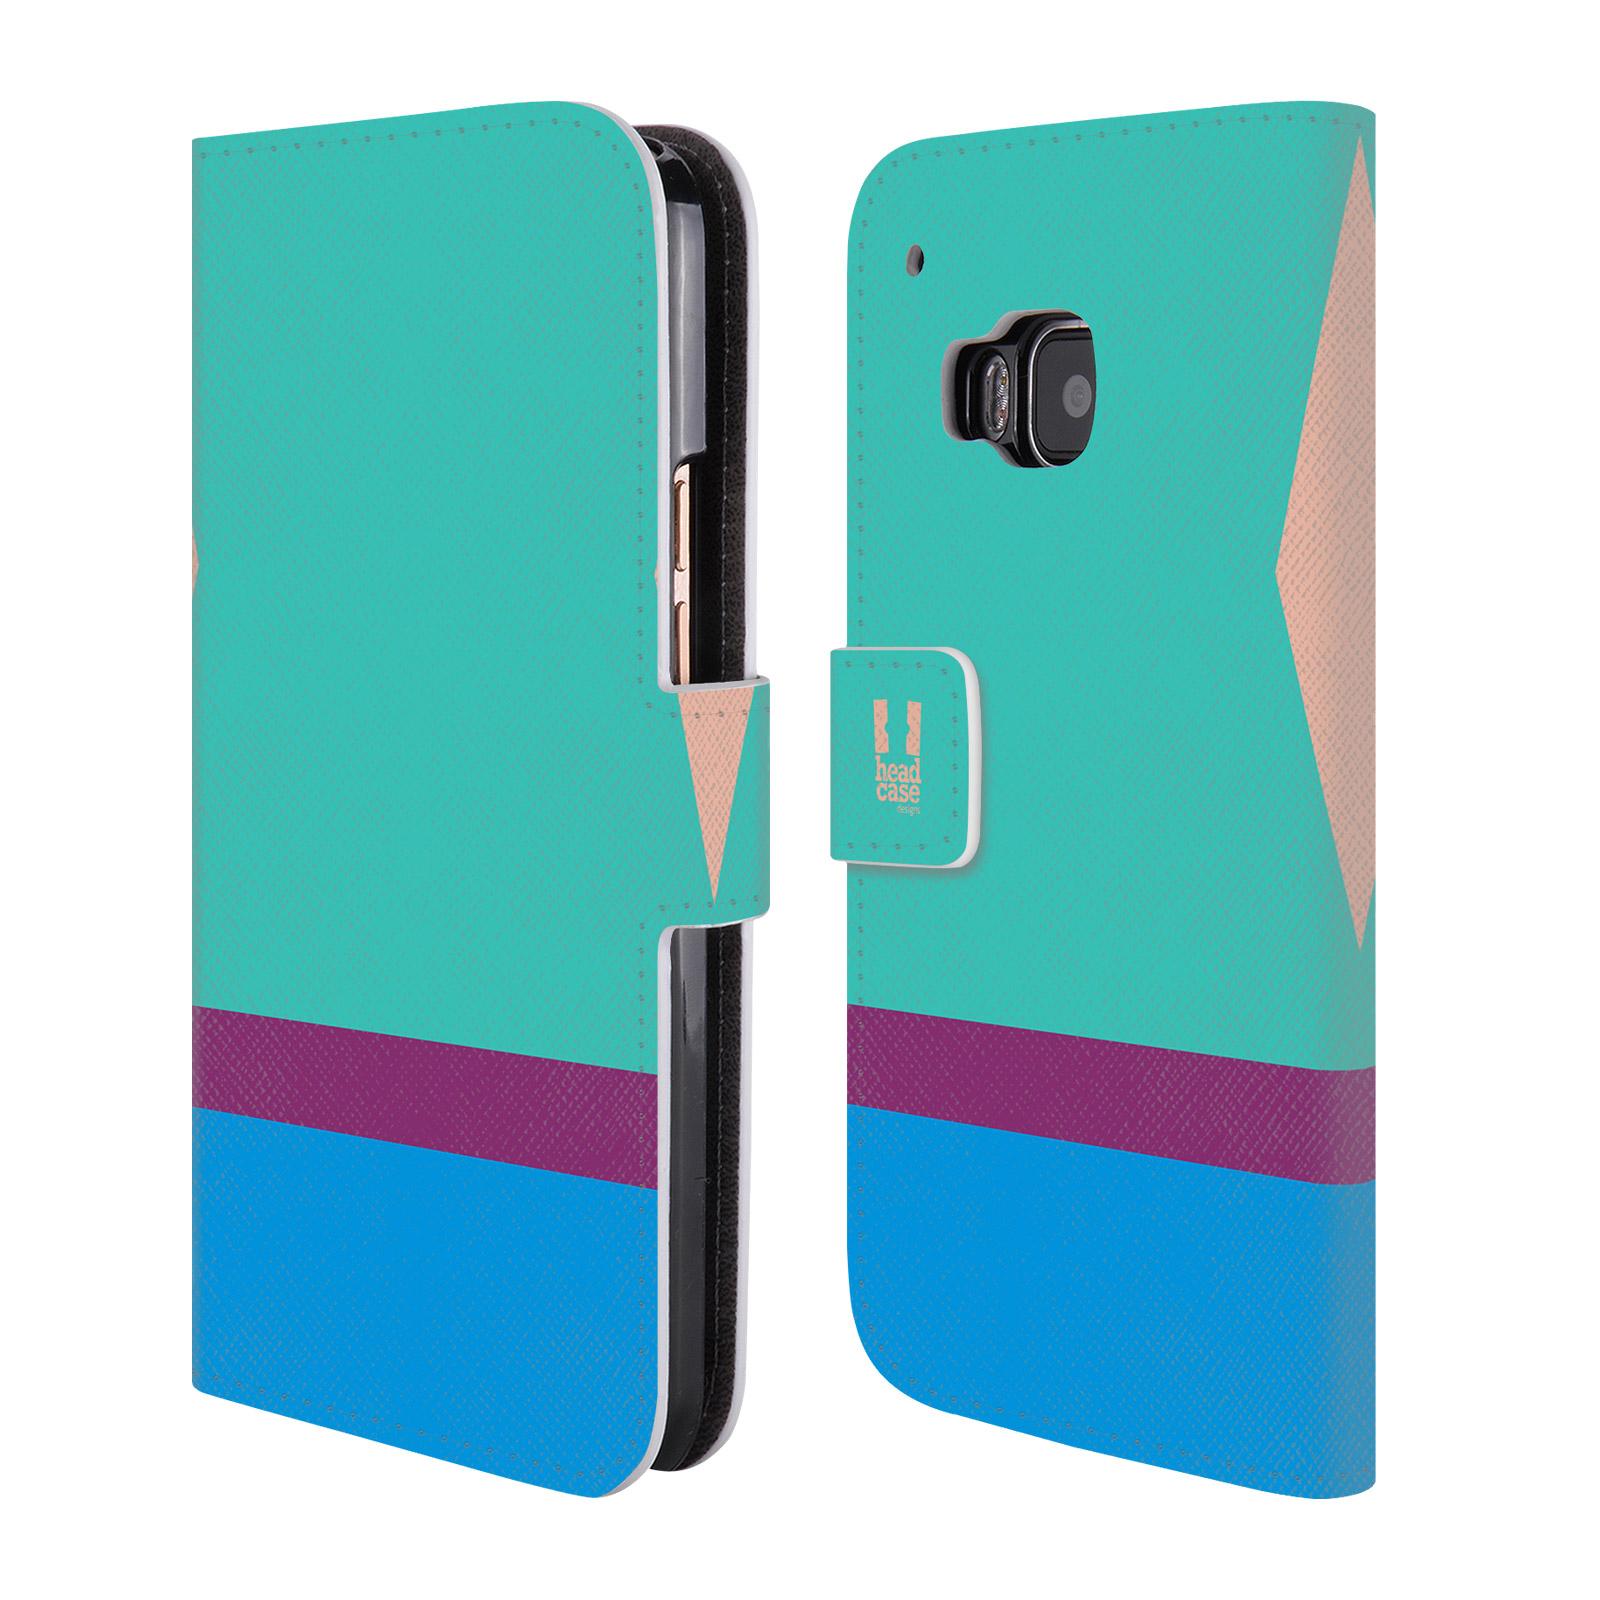 HEAD CASE Flipové pouzdro pro mobil HTC ONE M9 barevné tvary modrá a fialový pruh